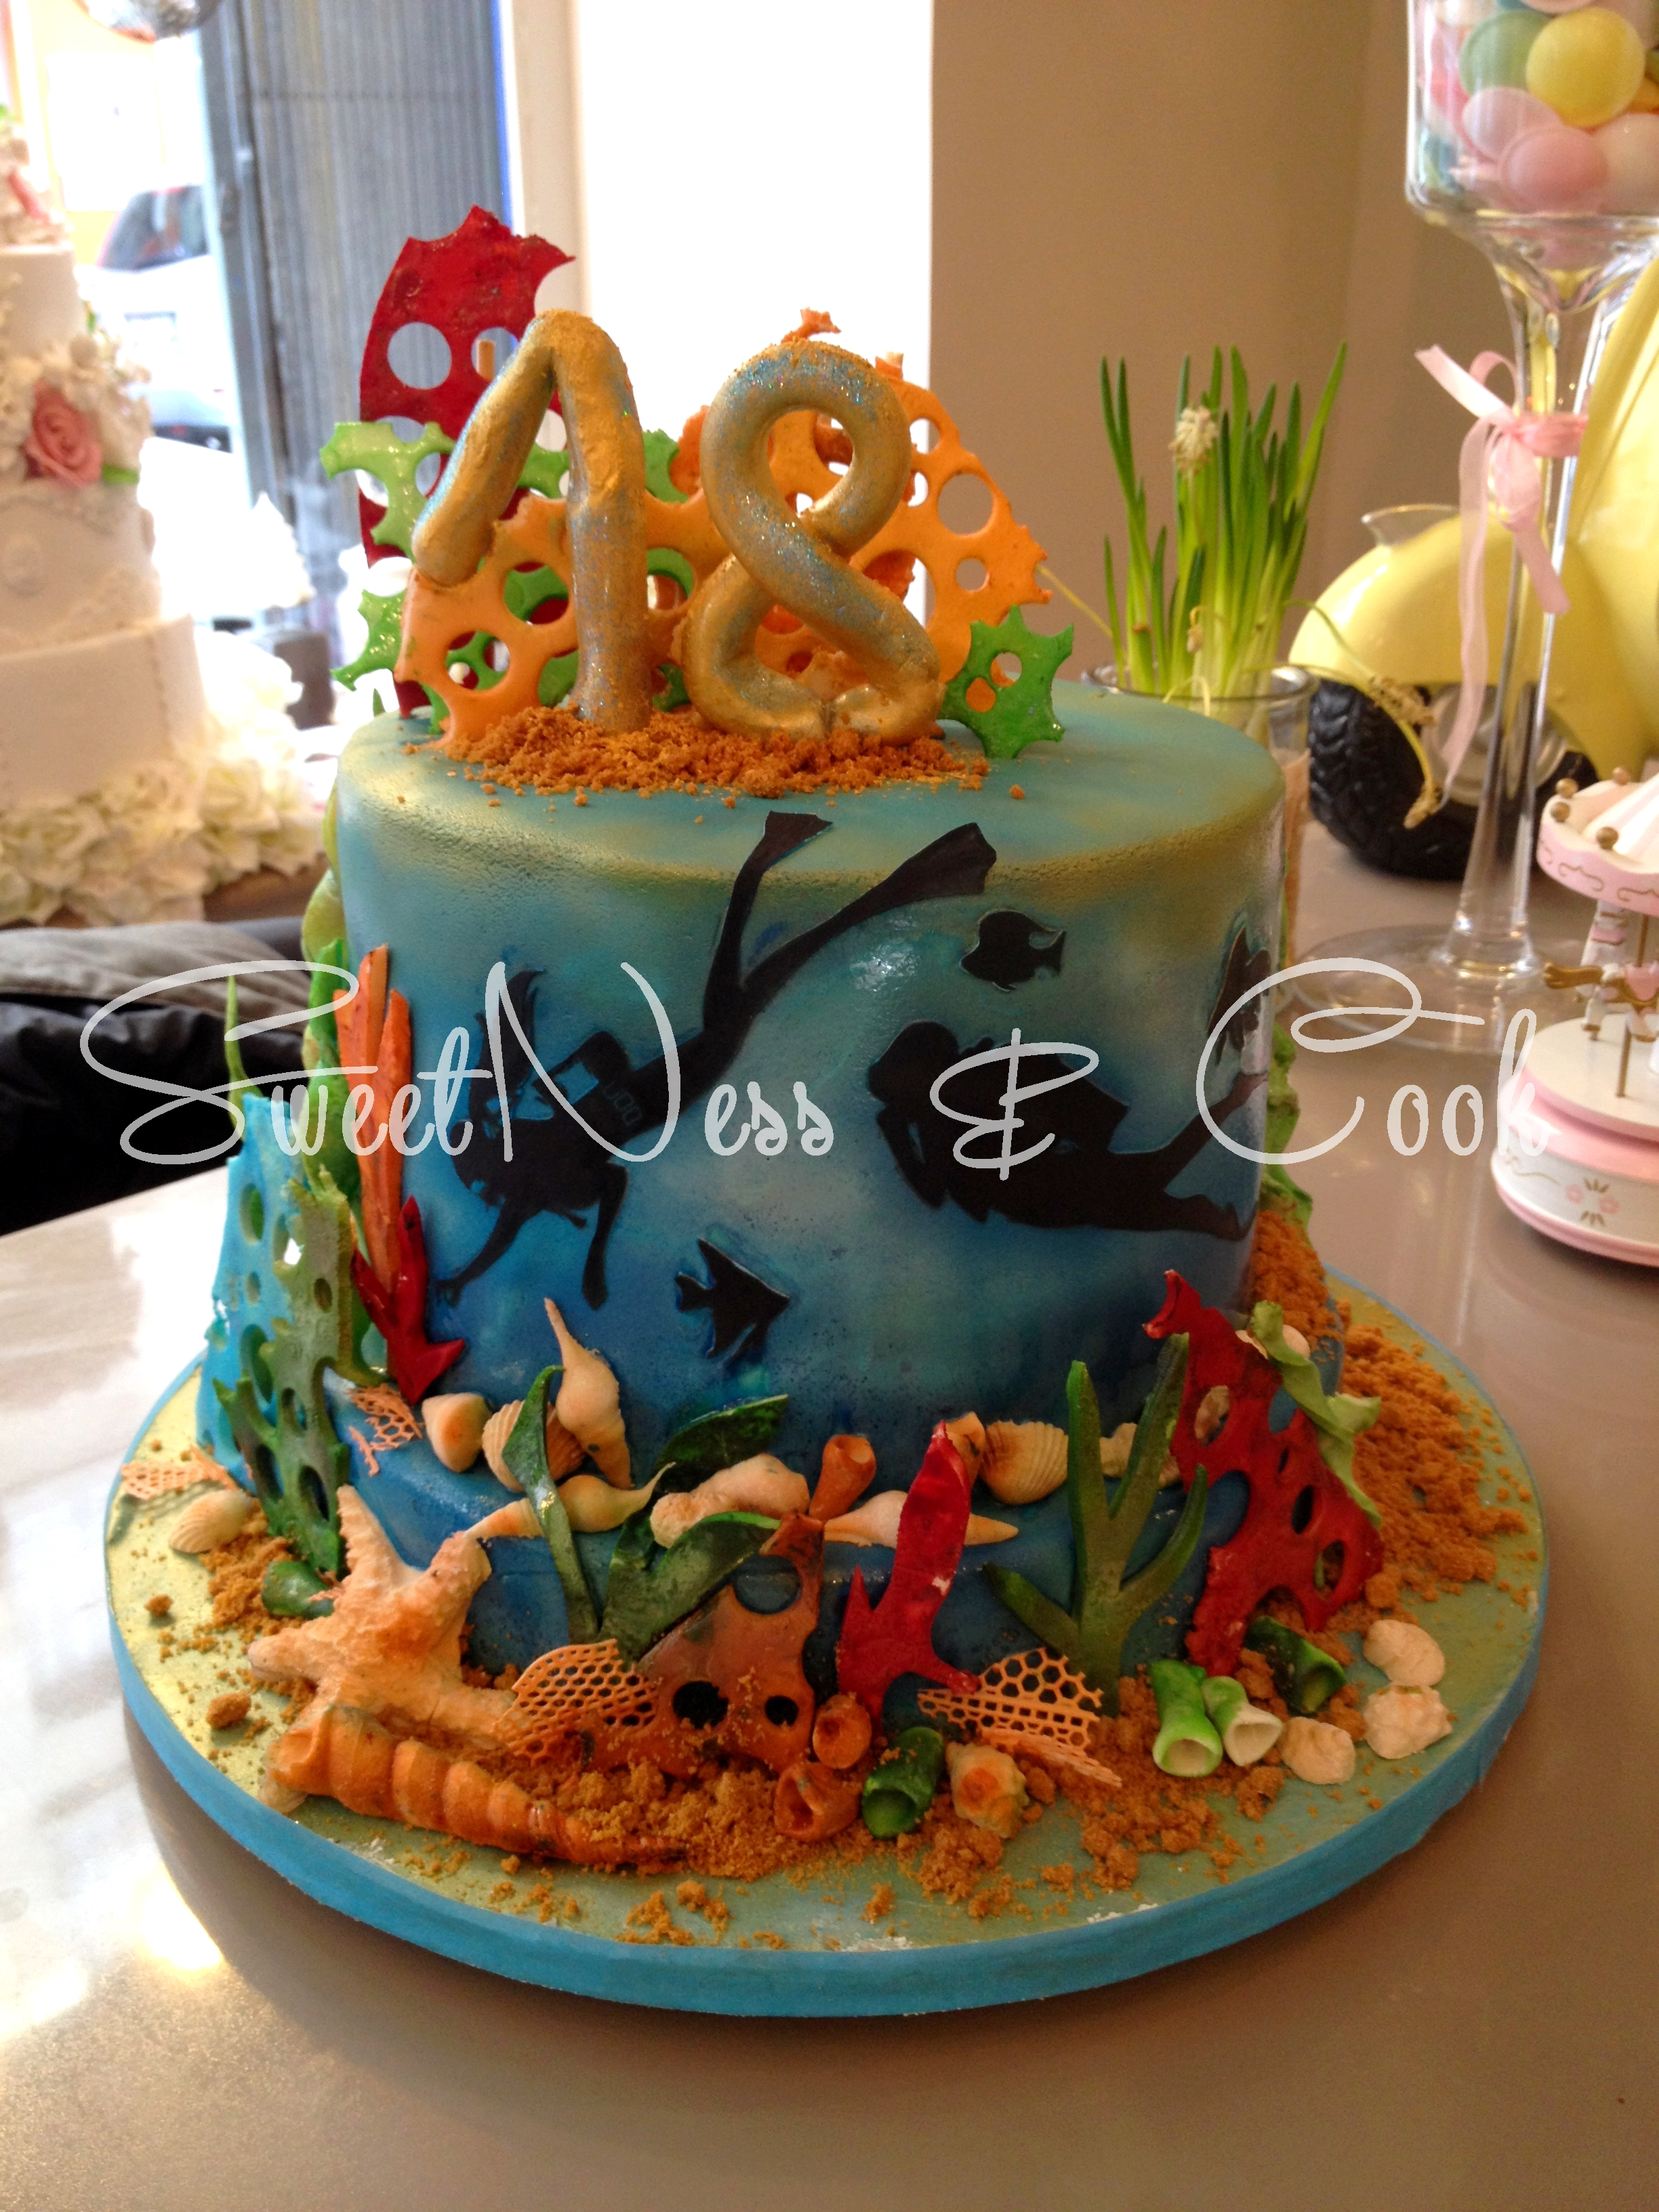 Cake Design Plongée sous-marine